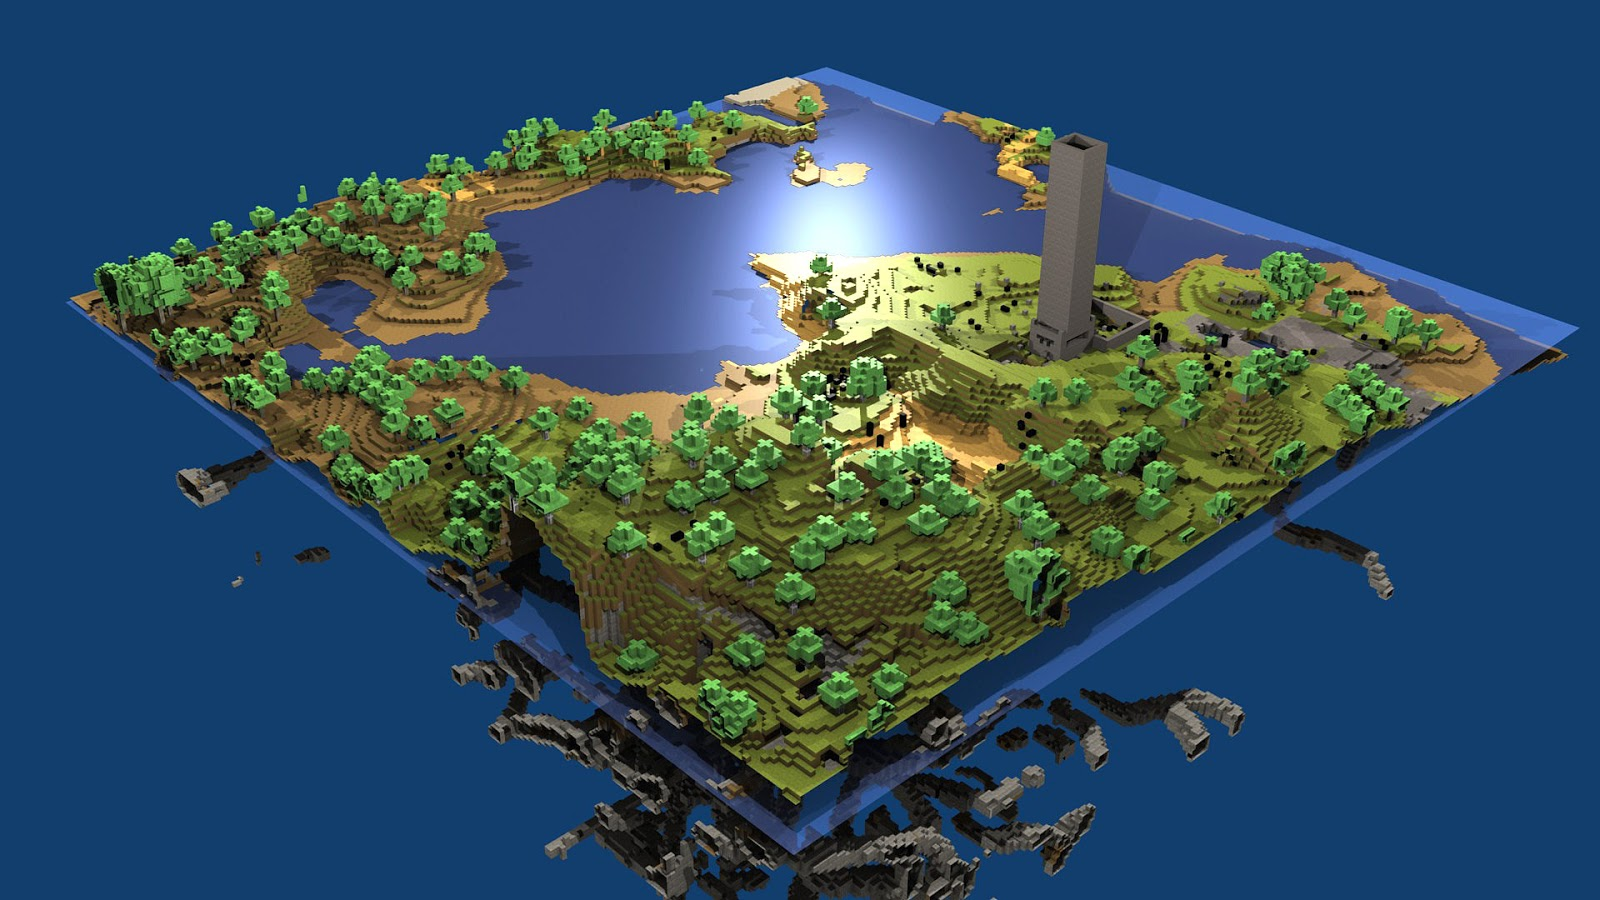 Minecraft Online Gratis Jugar Minecraft Gratis Sin Descargar